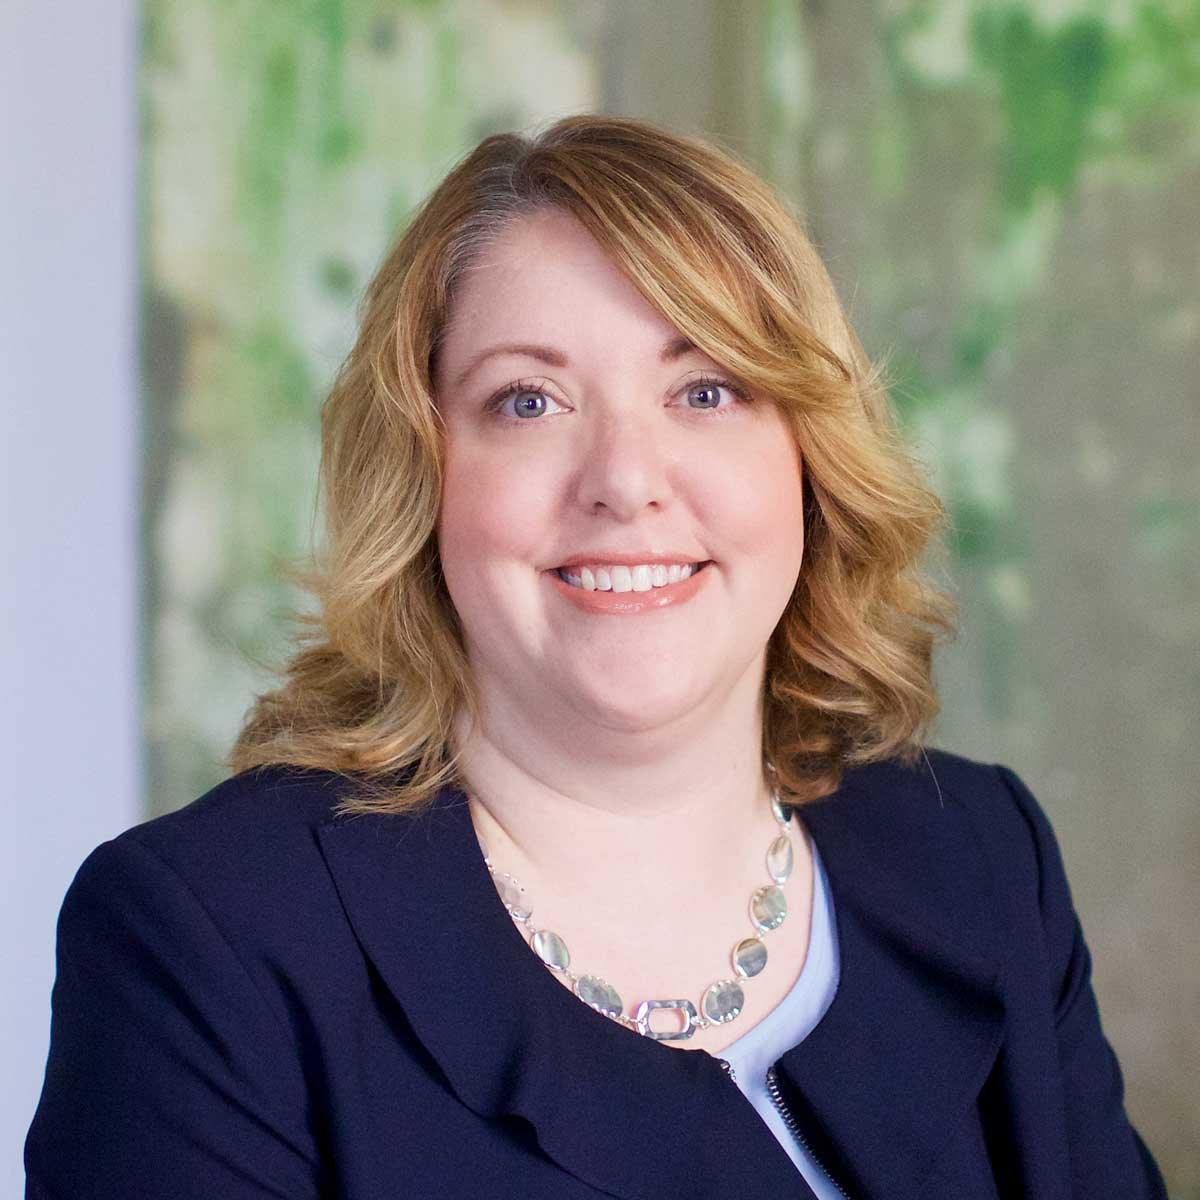 Melissa Chavis